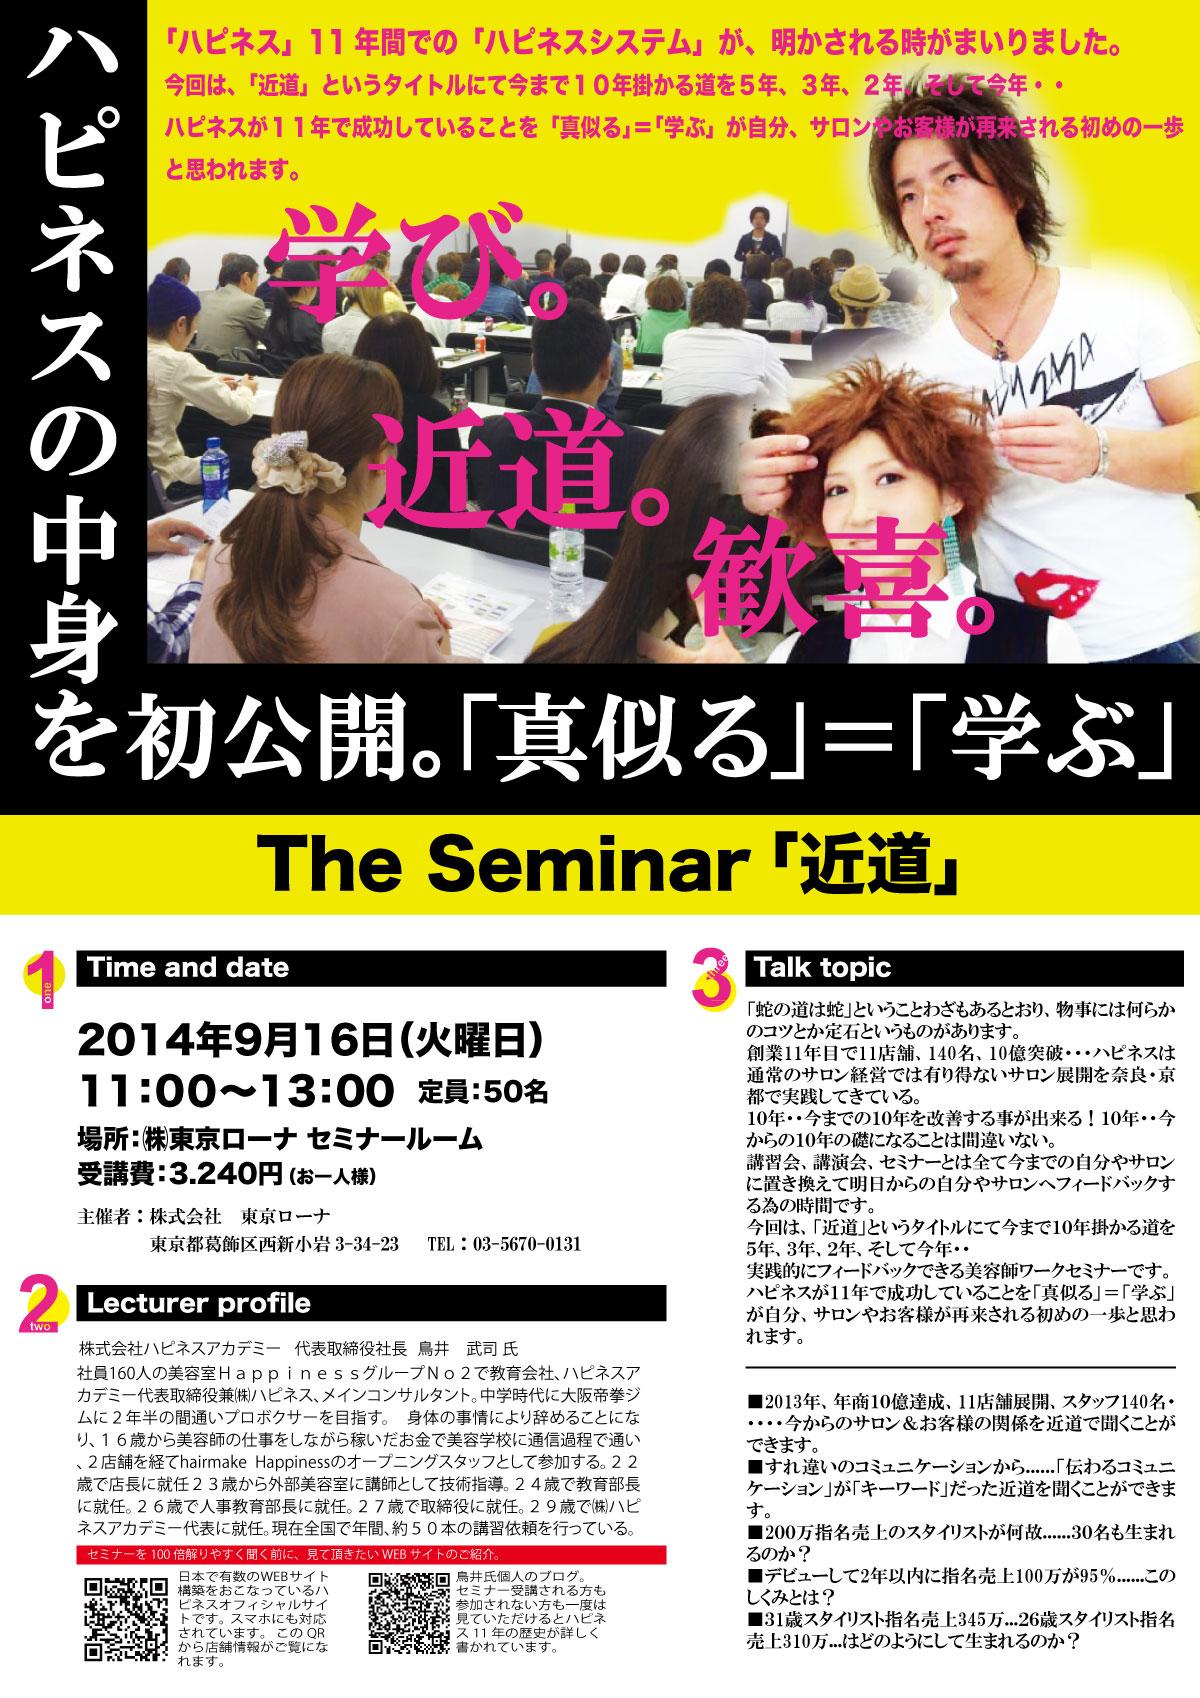 The Seminar「近道」